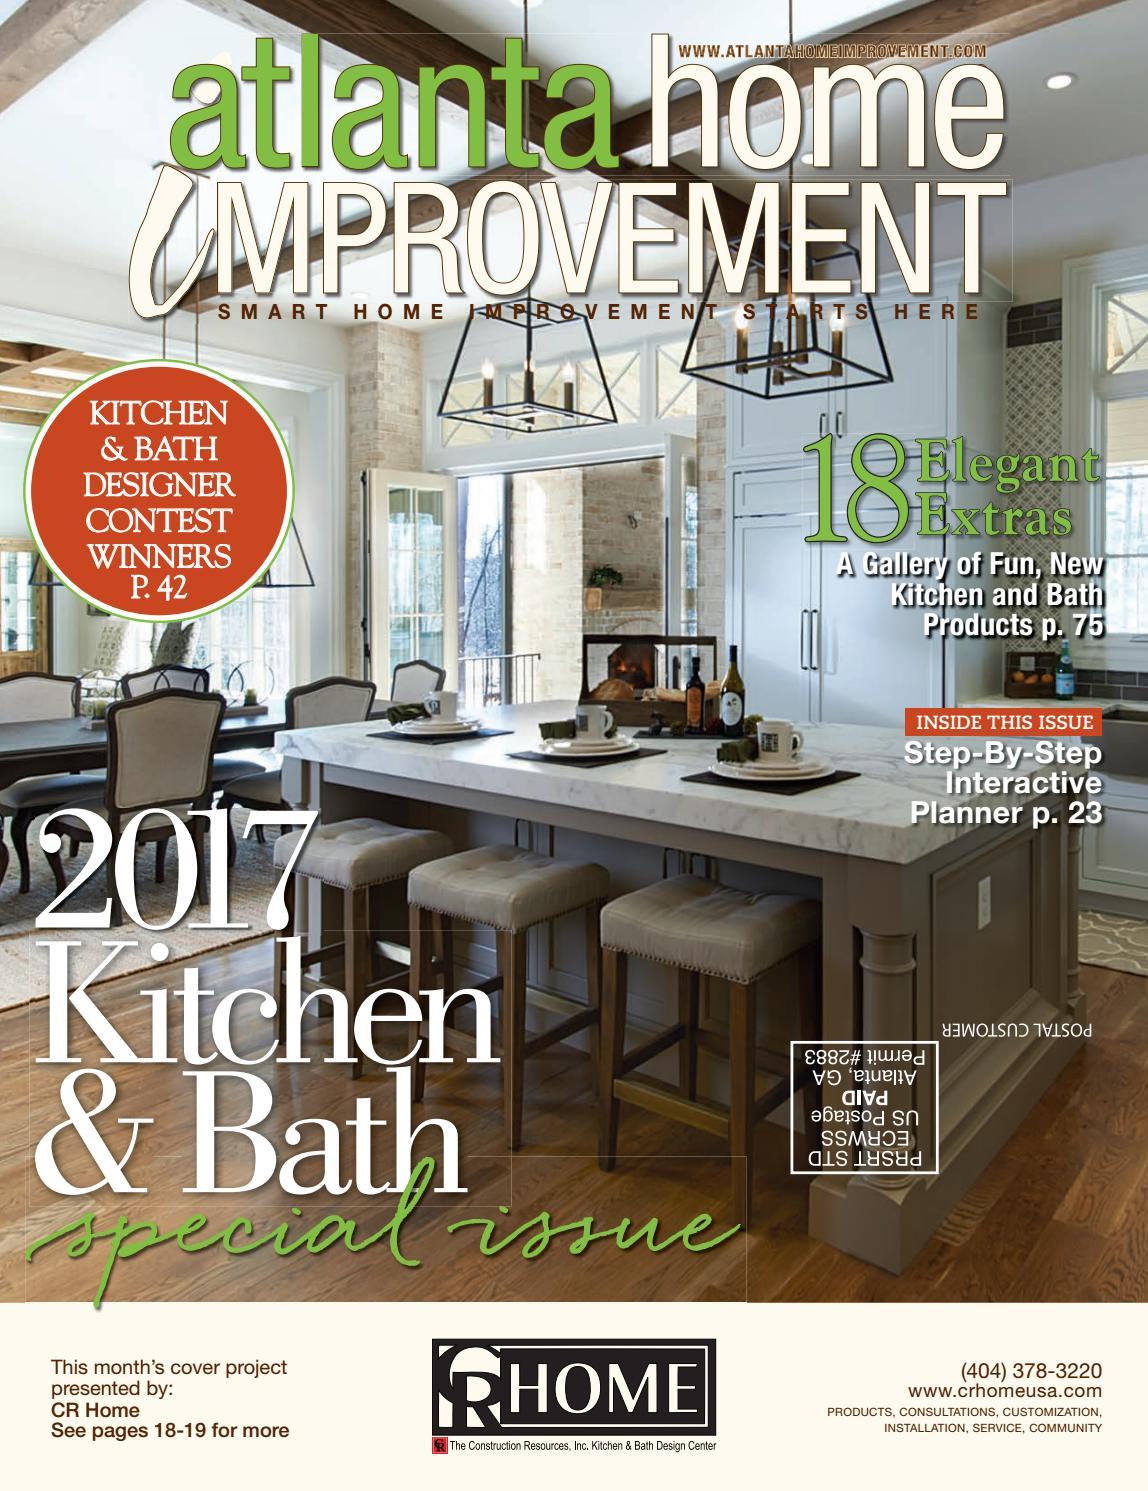 Atlanta home improvement 2017 kitchen  bath special issue